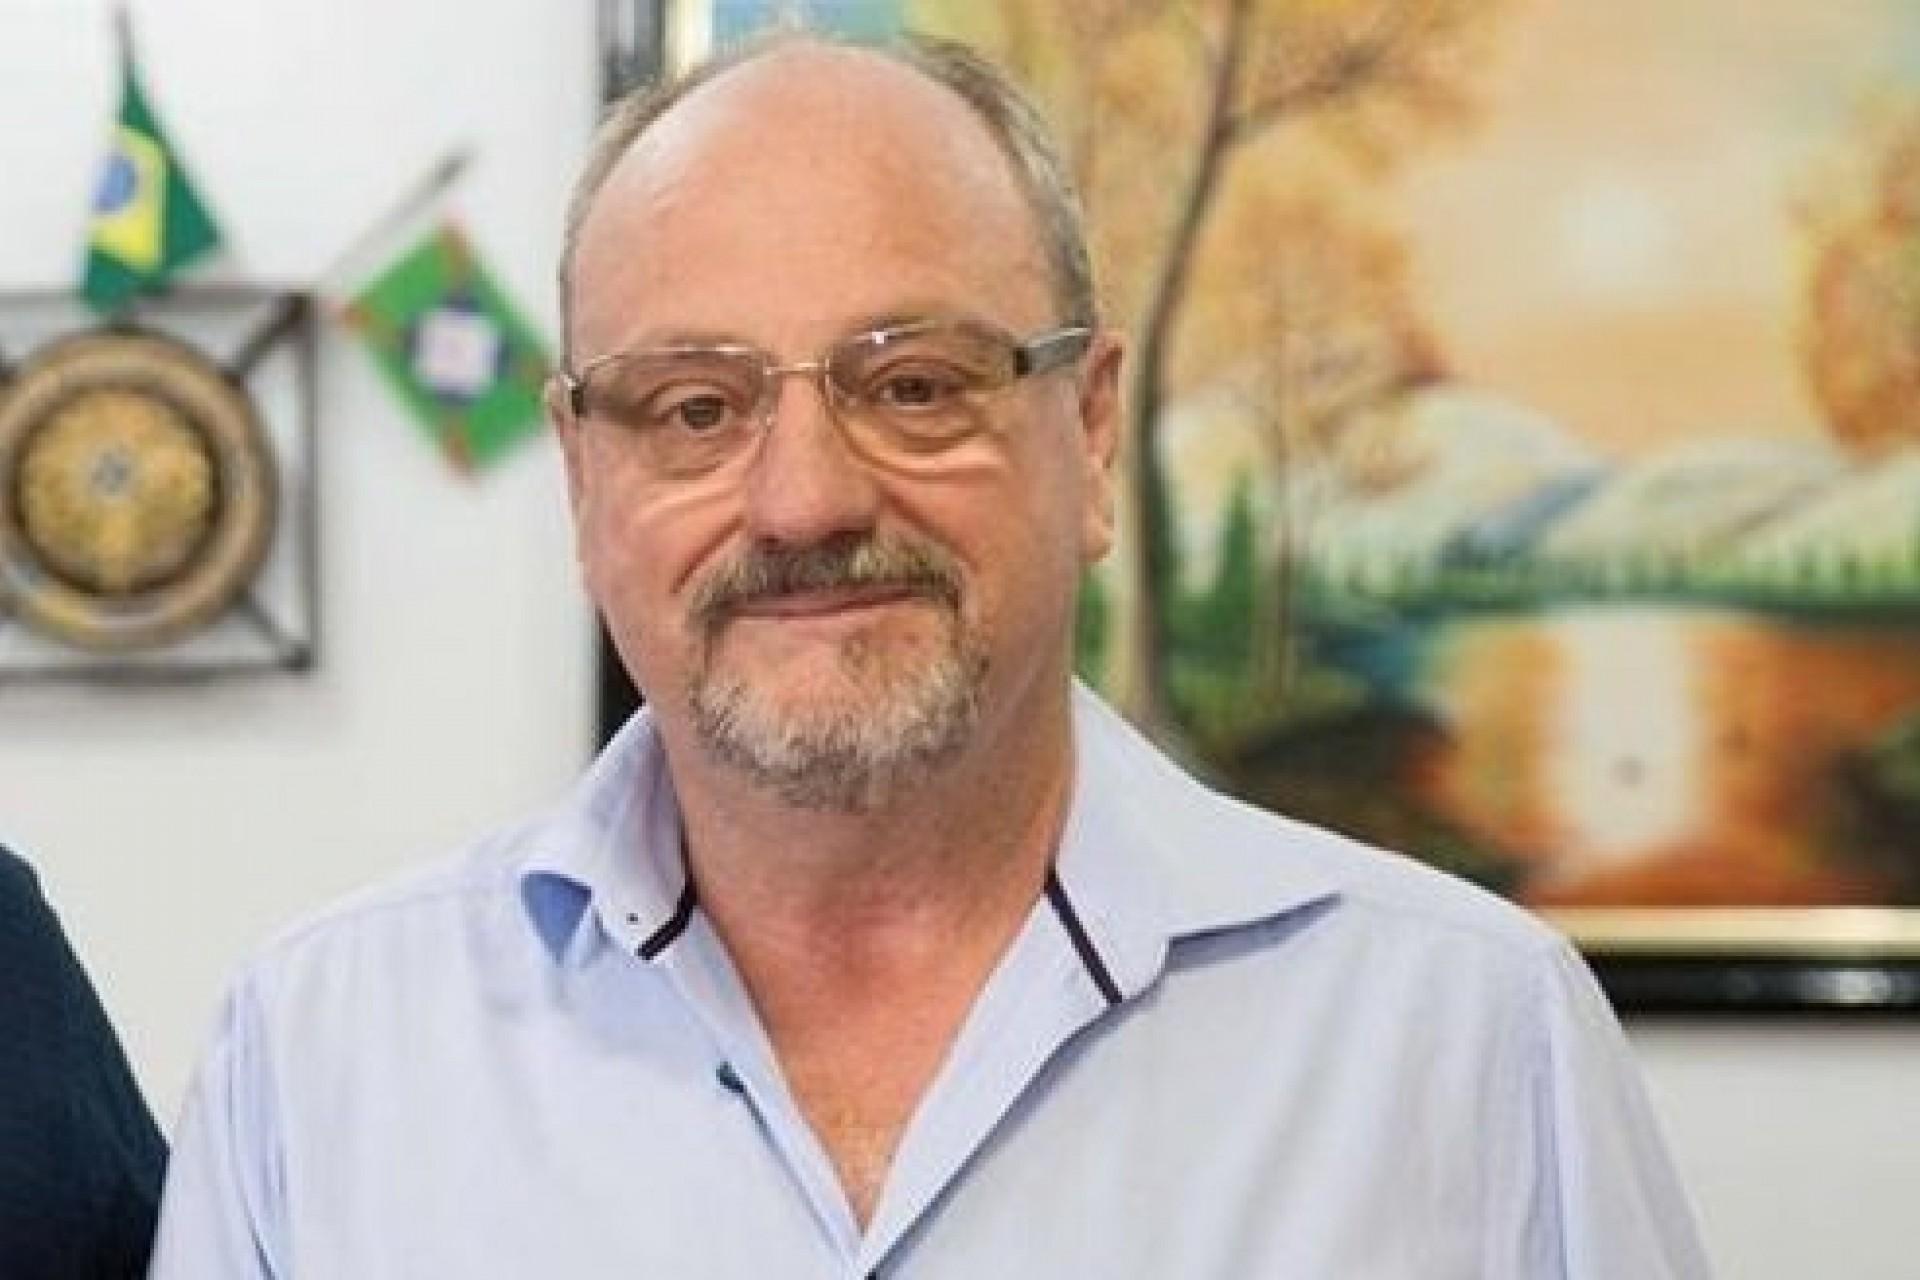 Maneco, prefeito de Missal, falece após procedimento cirúrgico